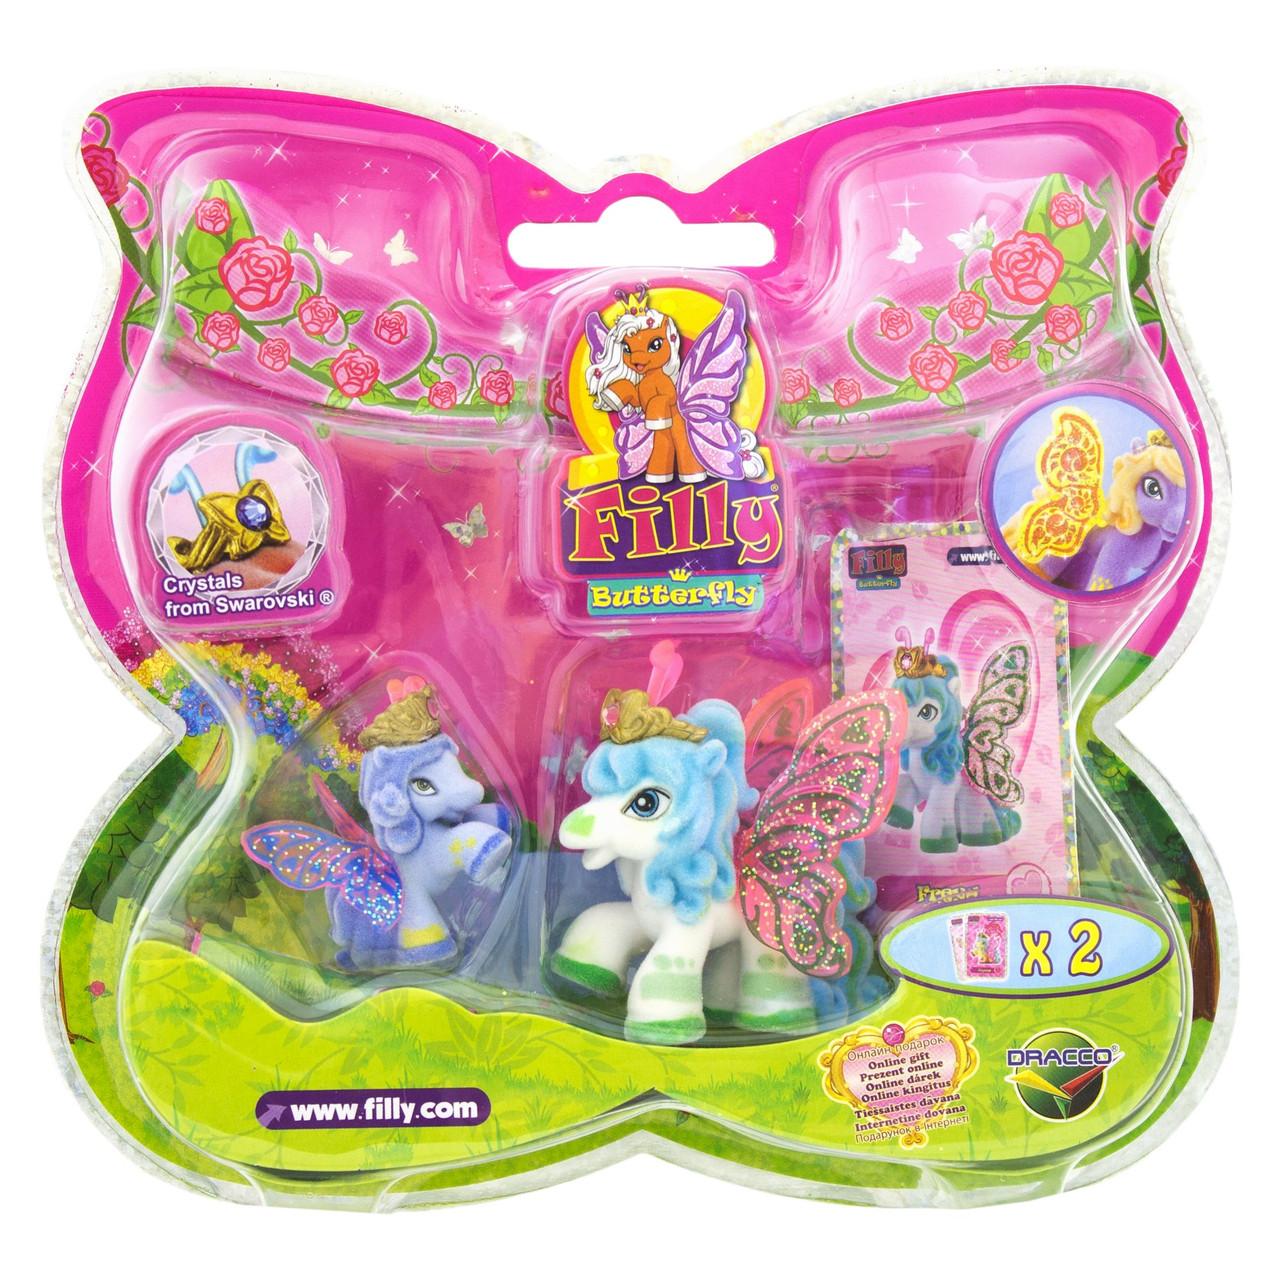 FILLY Butterfly Glitter Freya з кристалами Swarovski (Филли Блестящие бабочки - Фрейя и малыш )